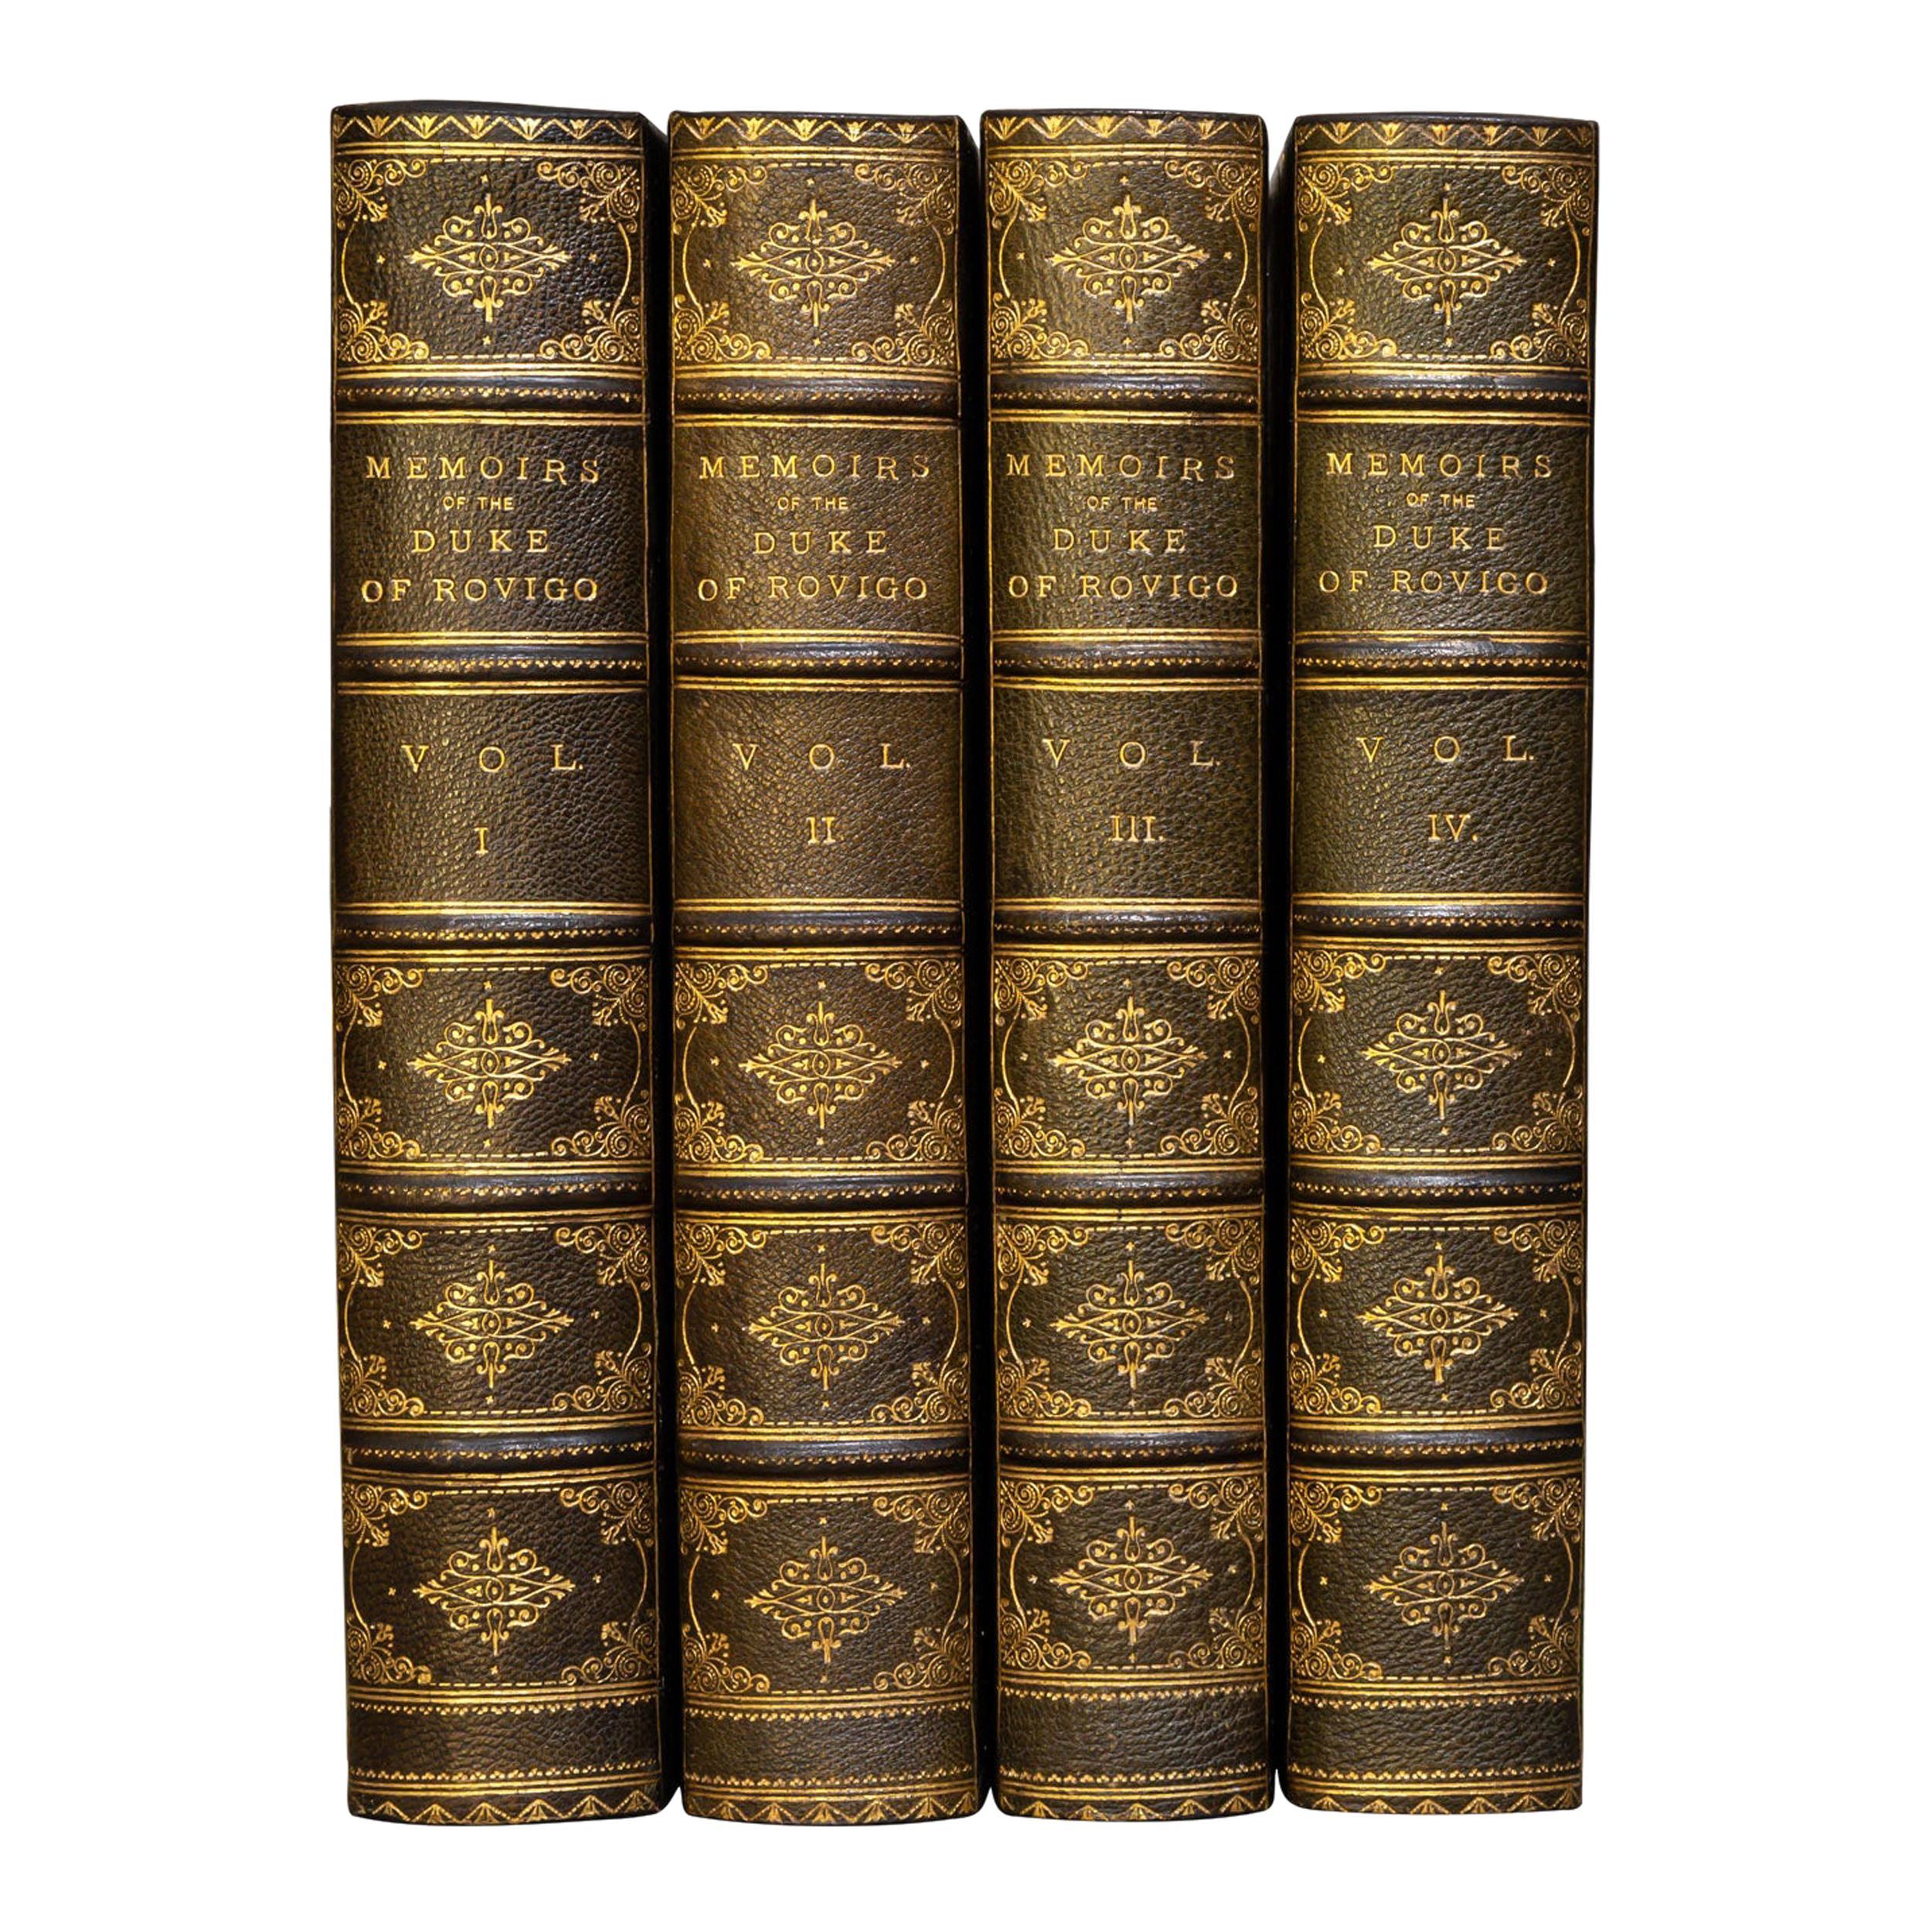 M.Savary, Memoirs Of The Duke Rovigo